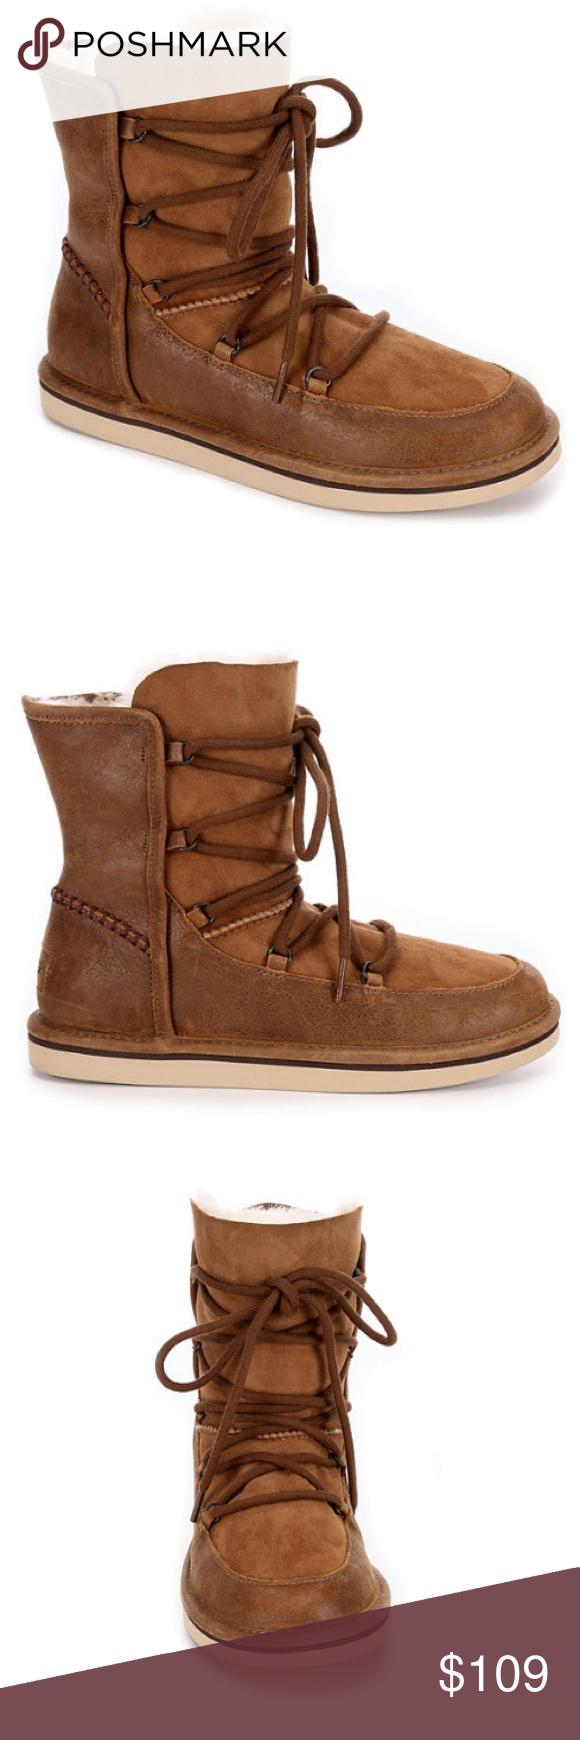 c7481a05cc3 ❤️New Ugg Lodge Chocolate Laced up boots Sz 10 ❤️New Ugg Lodge ...